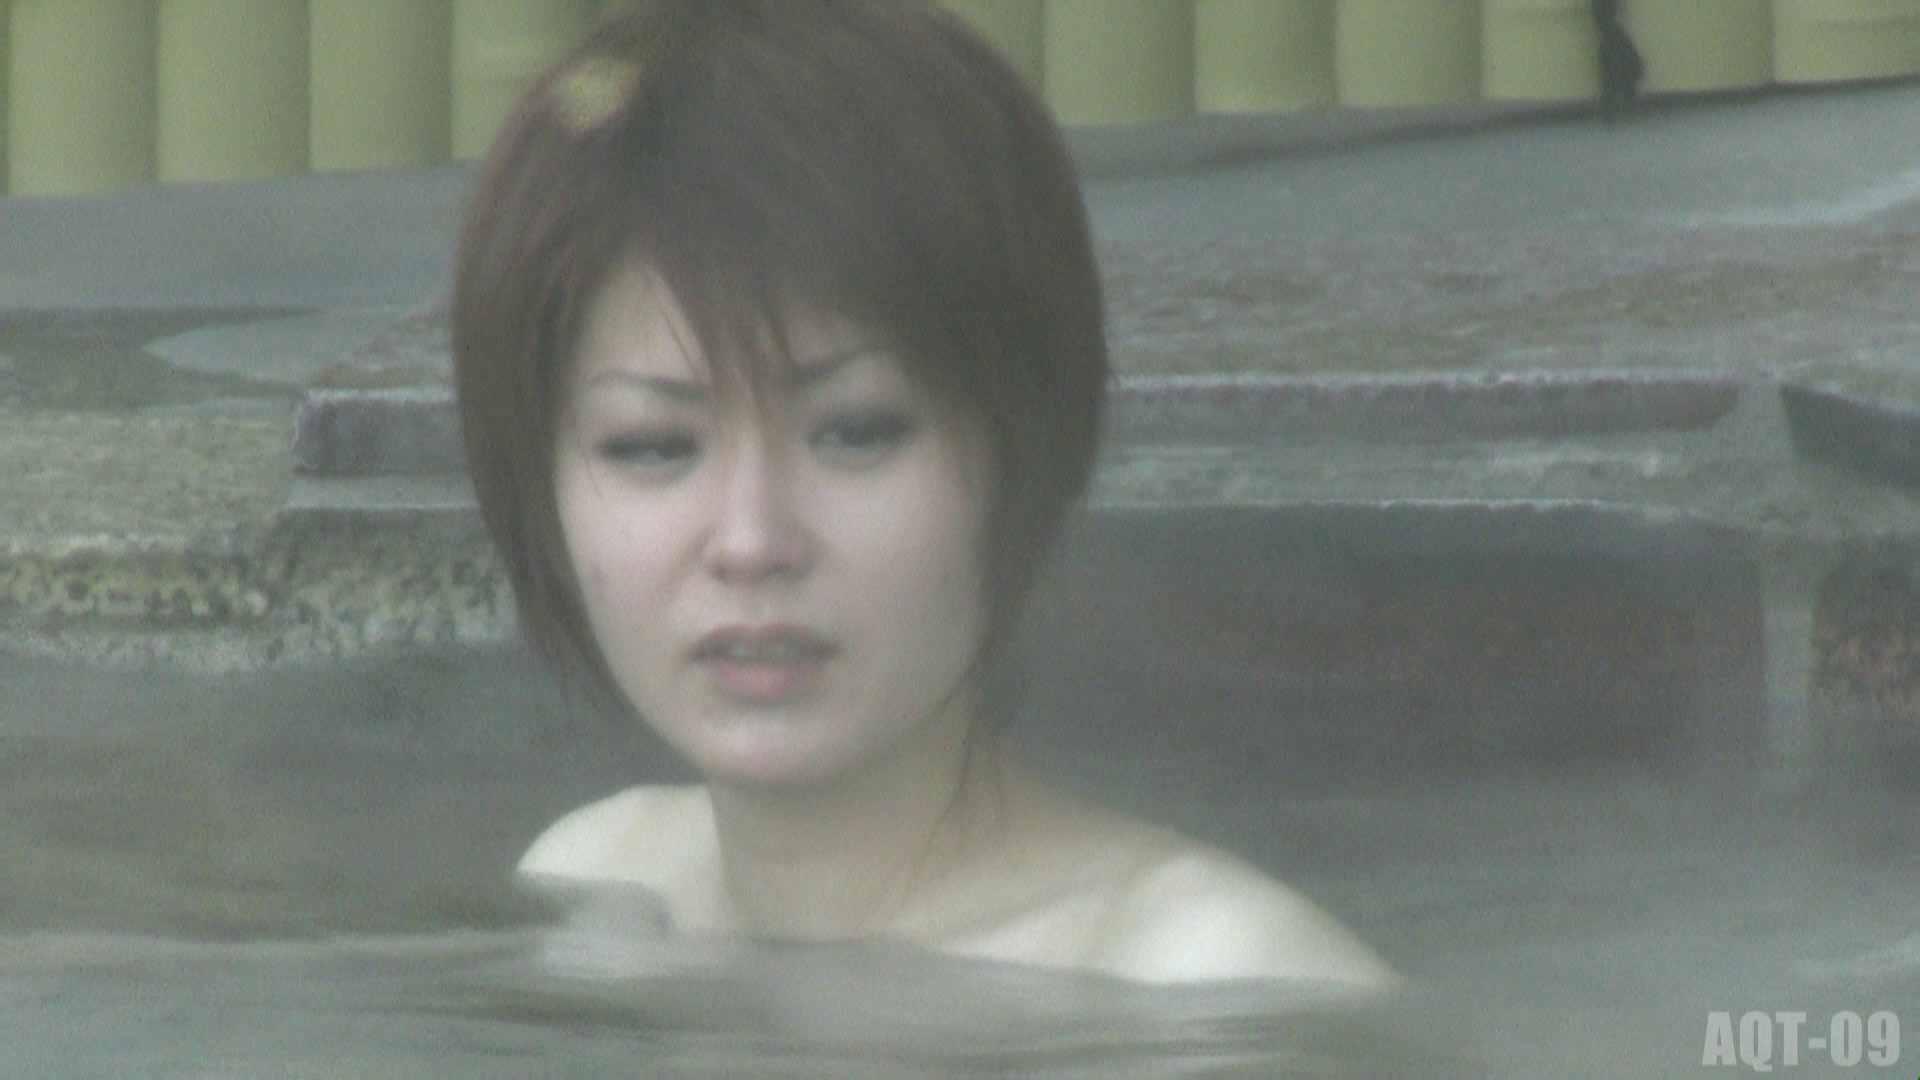 Aquaな露天風呂Vol.779 OLセックス 覗きおまんこ画像 107画像 35